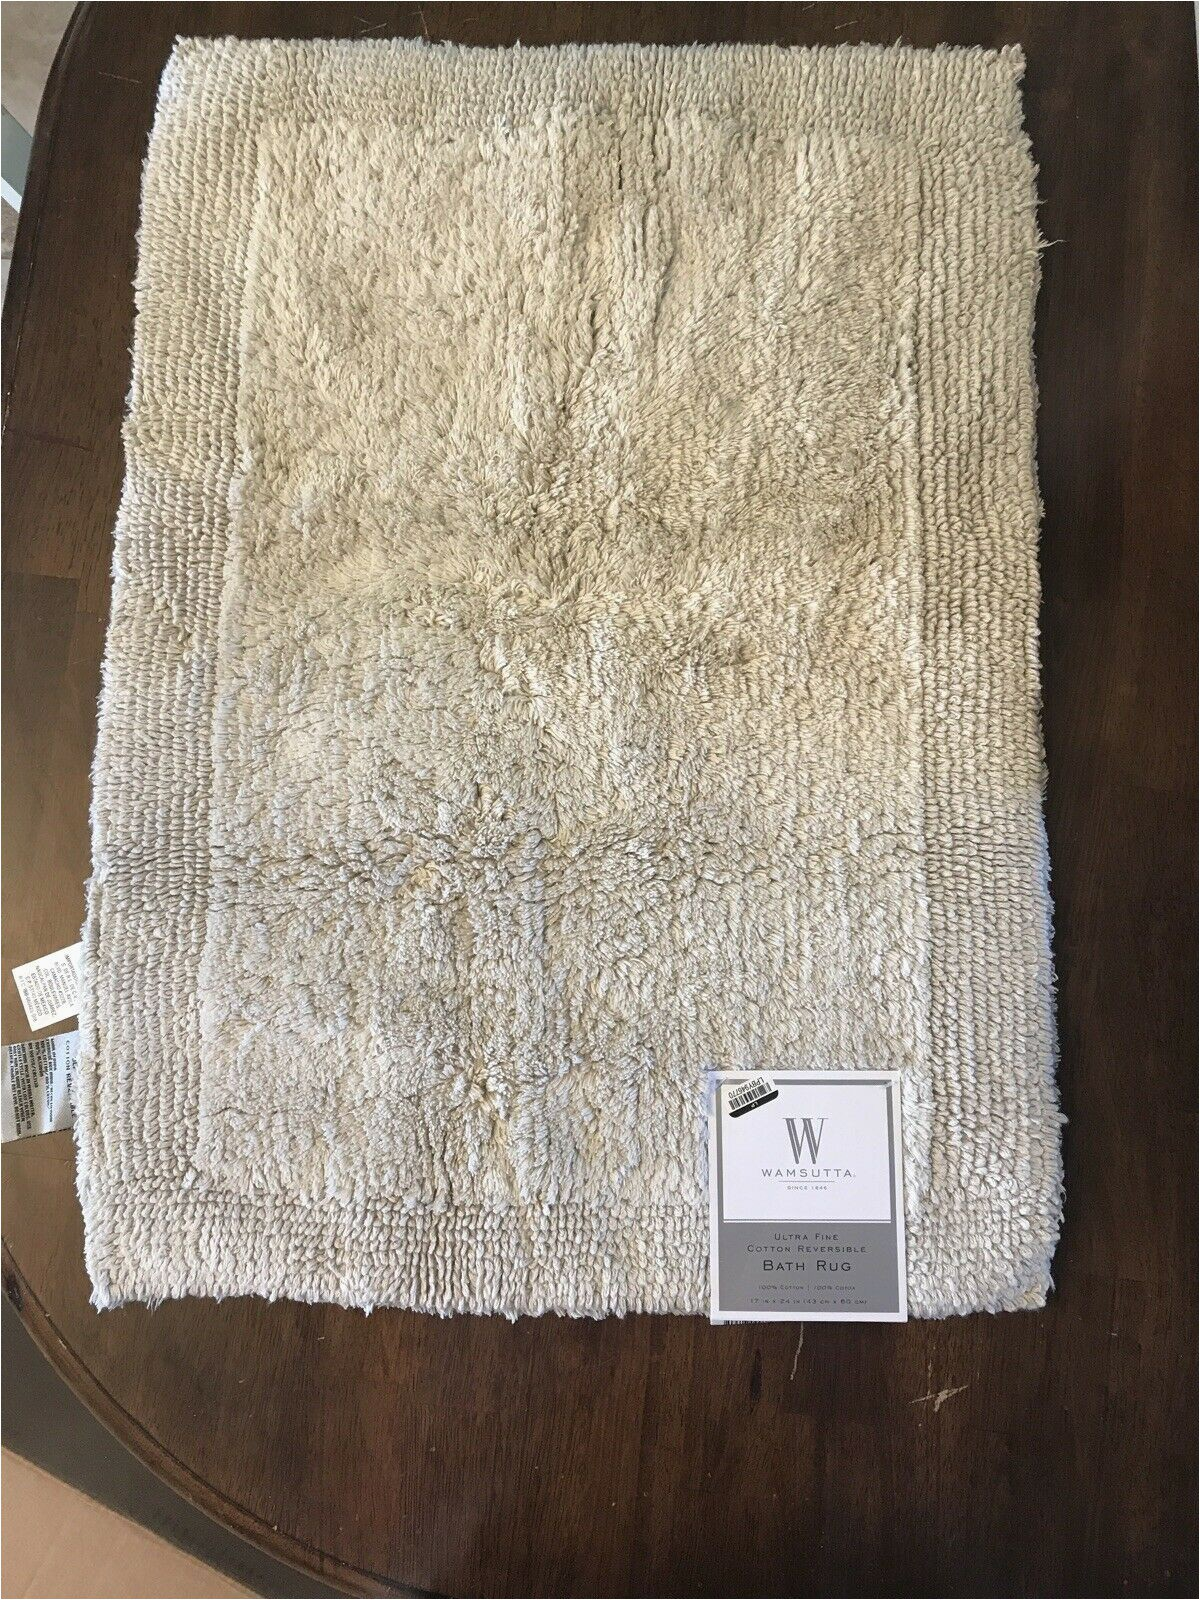 Wamsutta Bath Rug Colors Wamsutta Ultra Fine Cotton Reversible Bath Rug 17inx24in